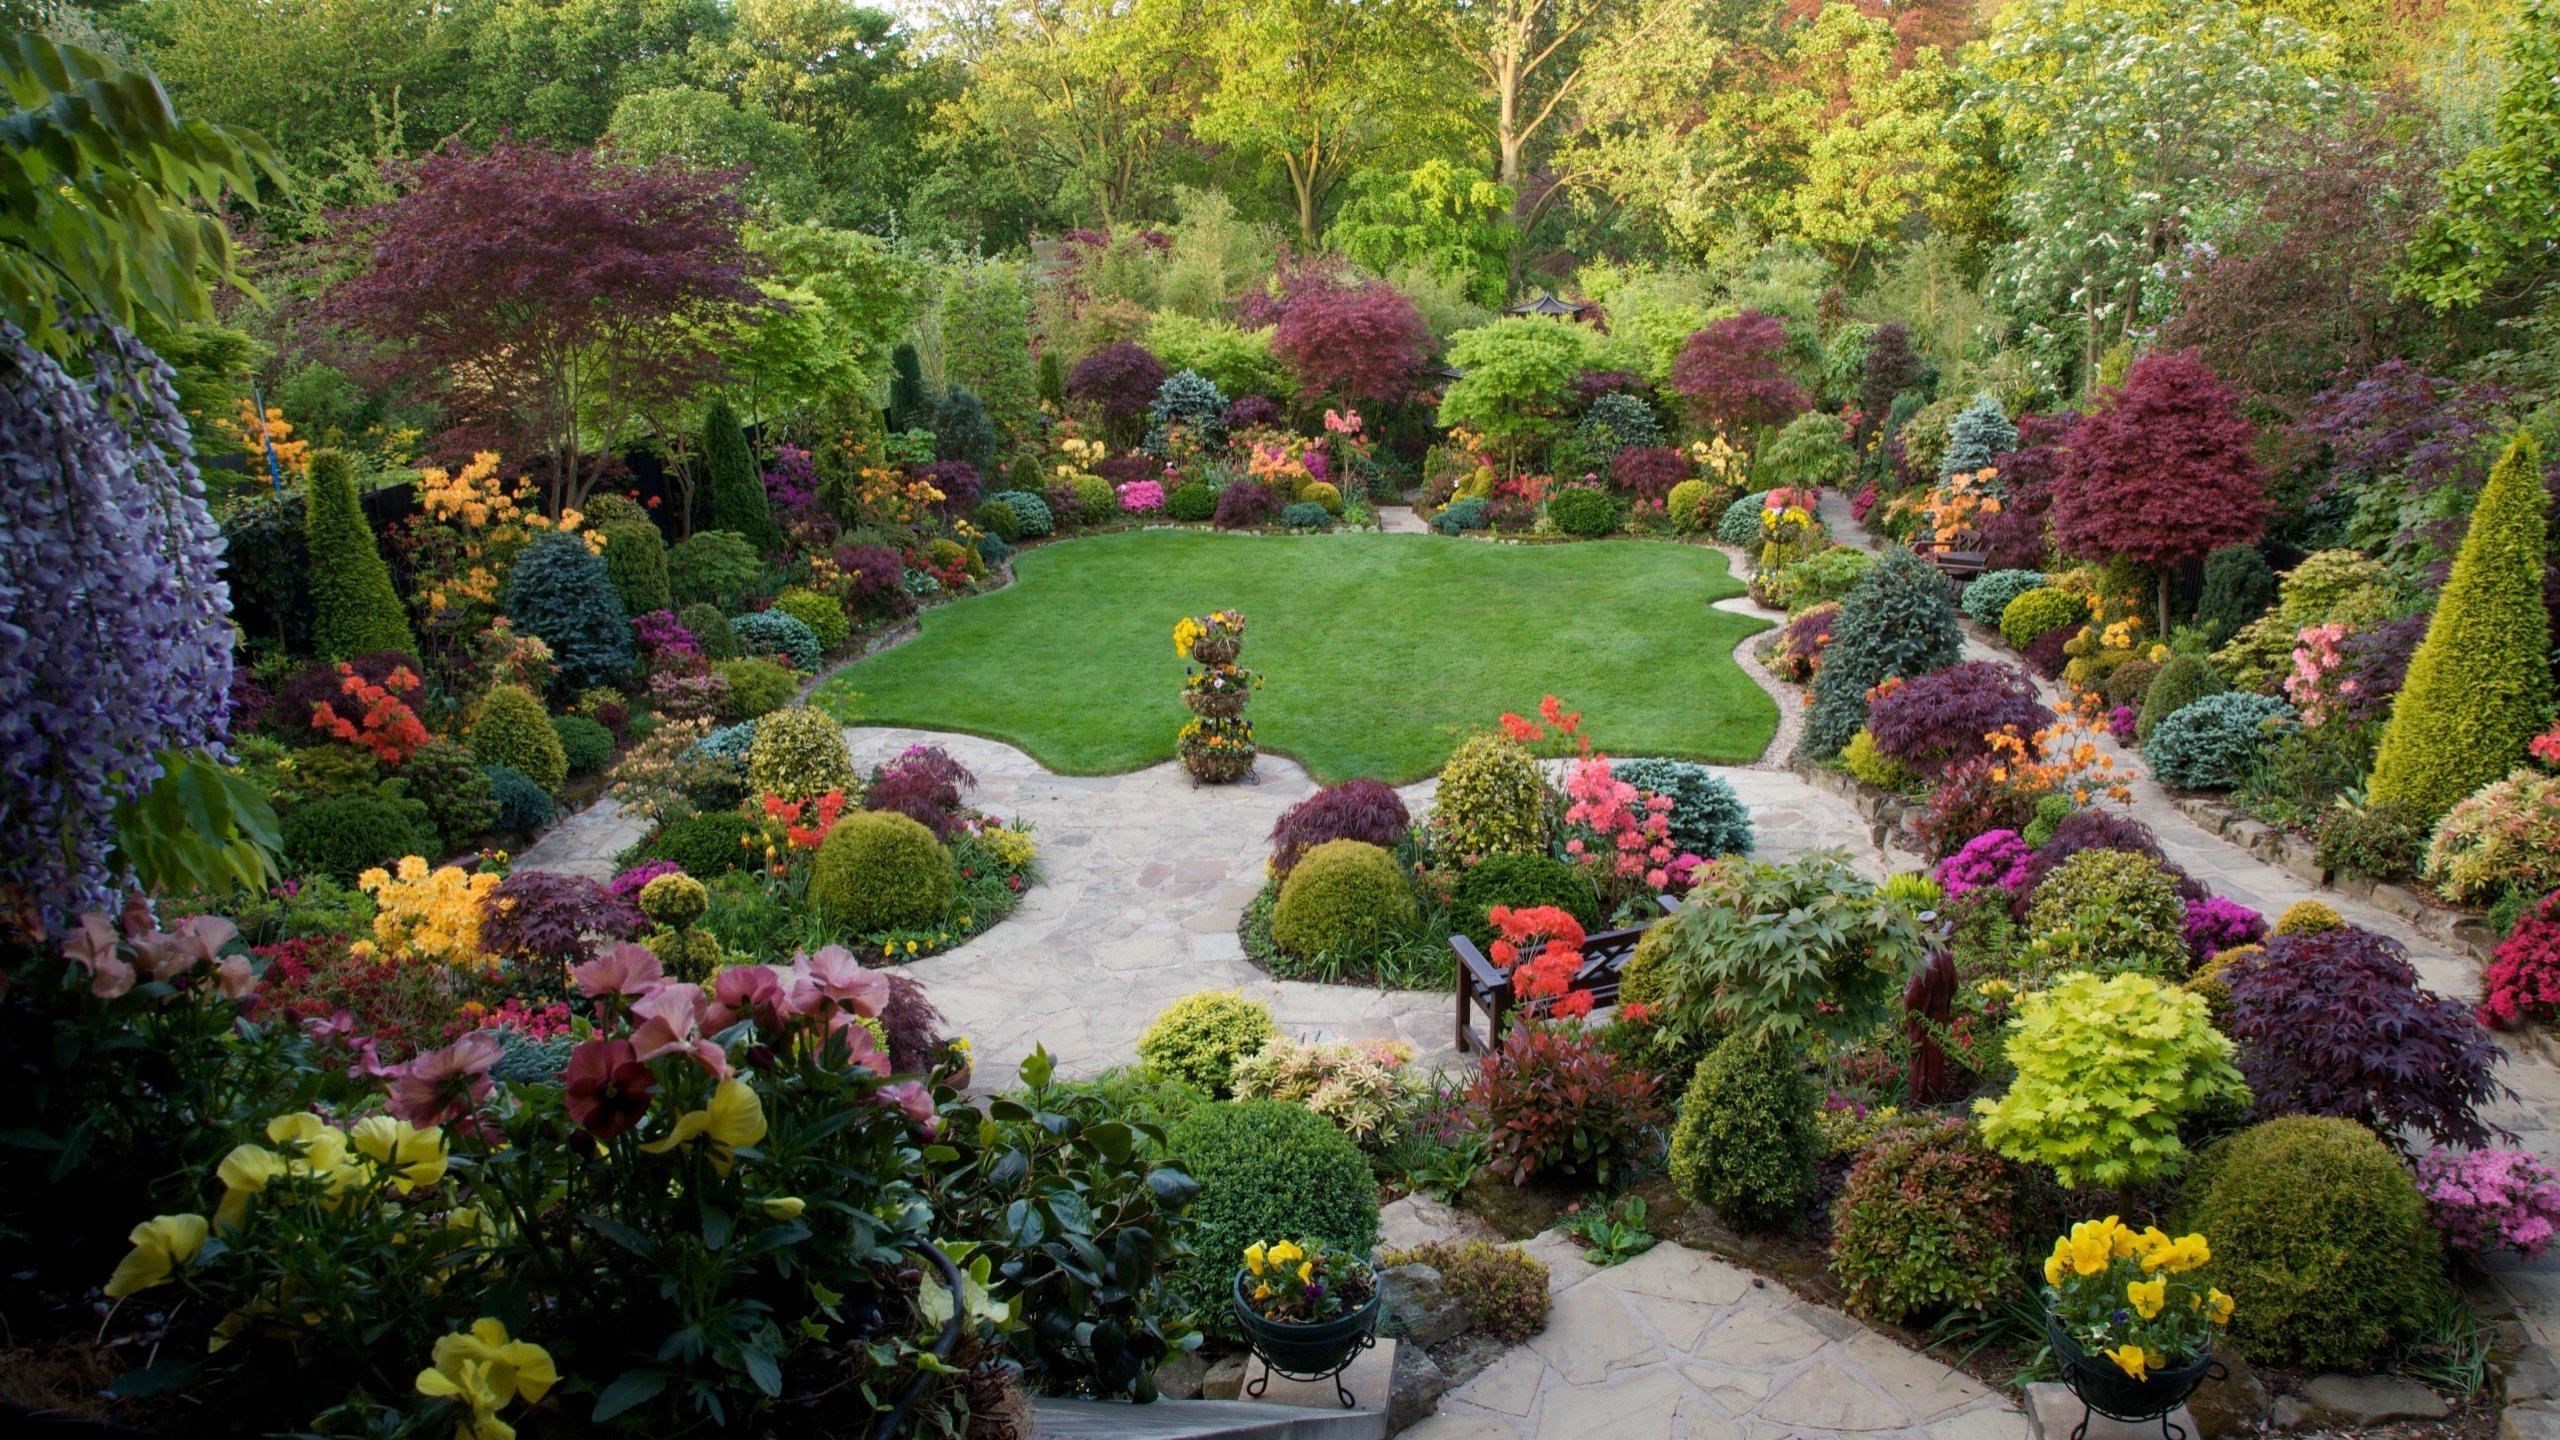 Free Download Garden Background Id 397030 Hd 2560x1440 For Desktop